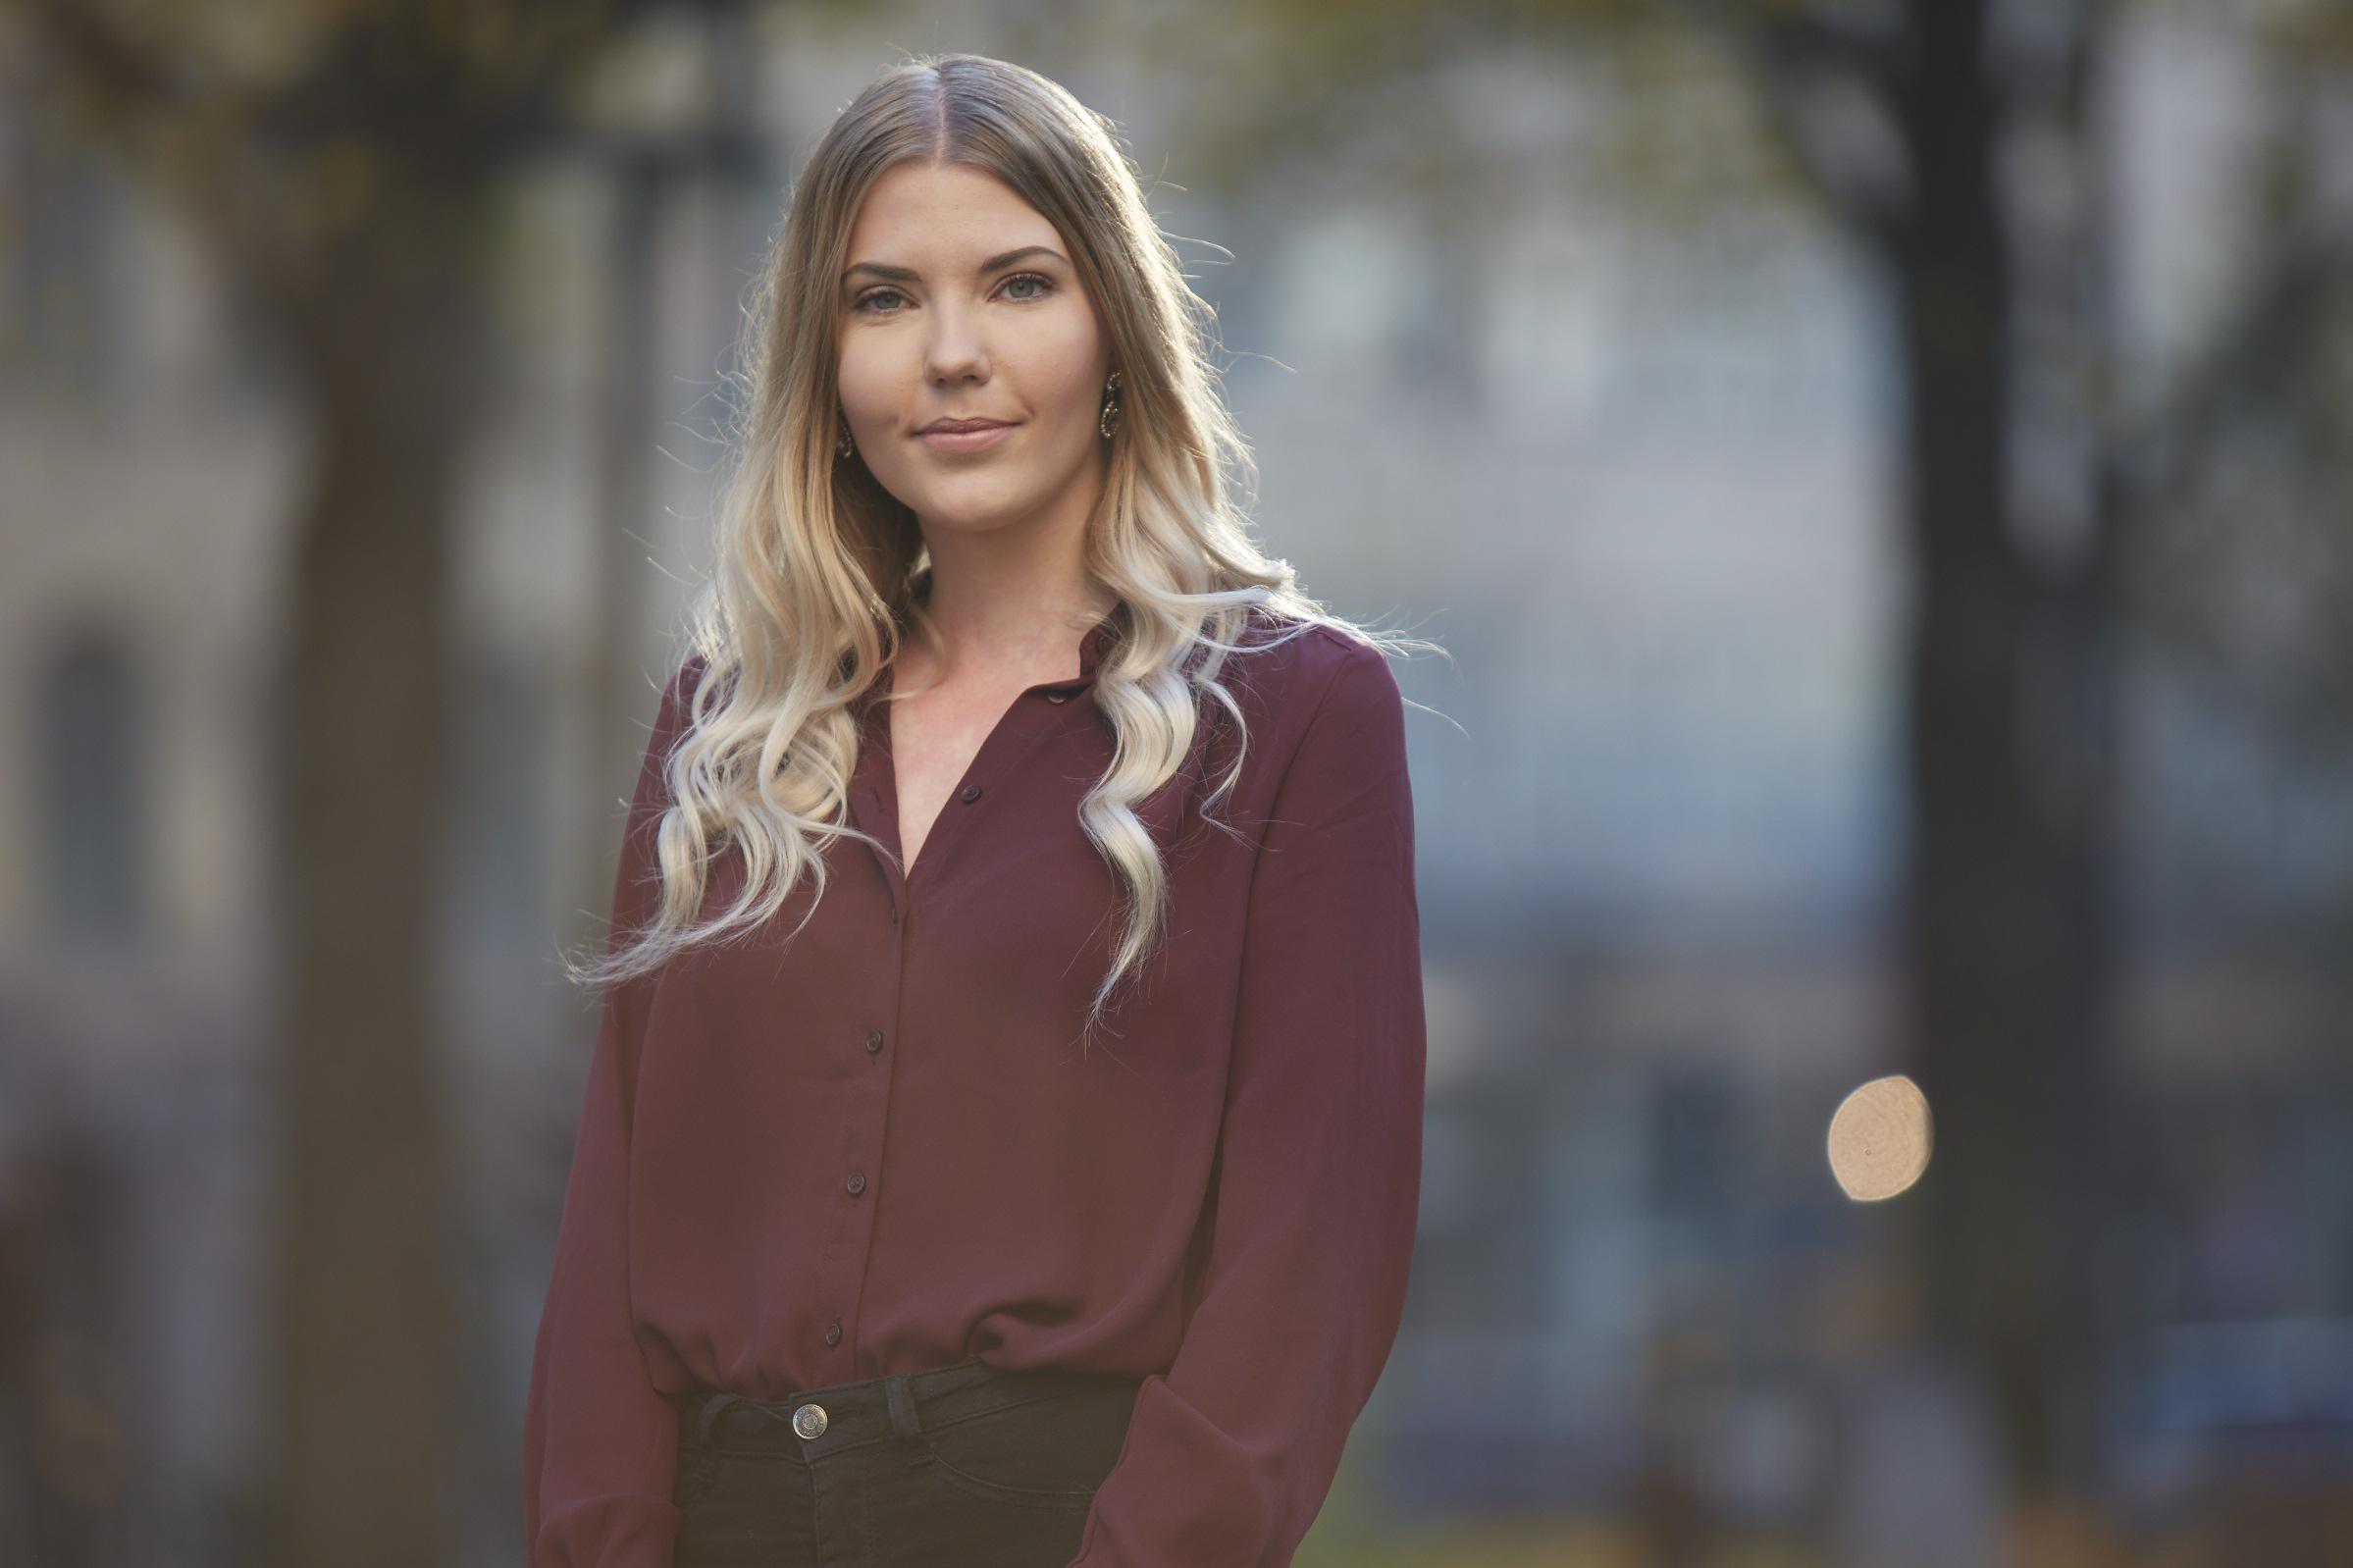 Amanda Lundberg